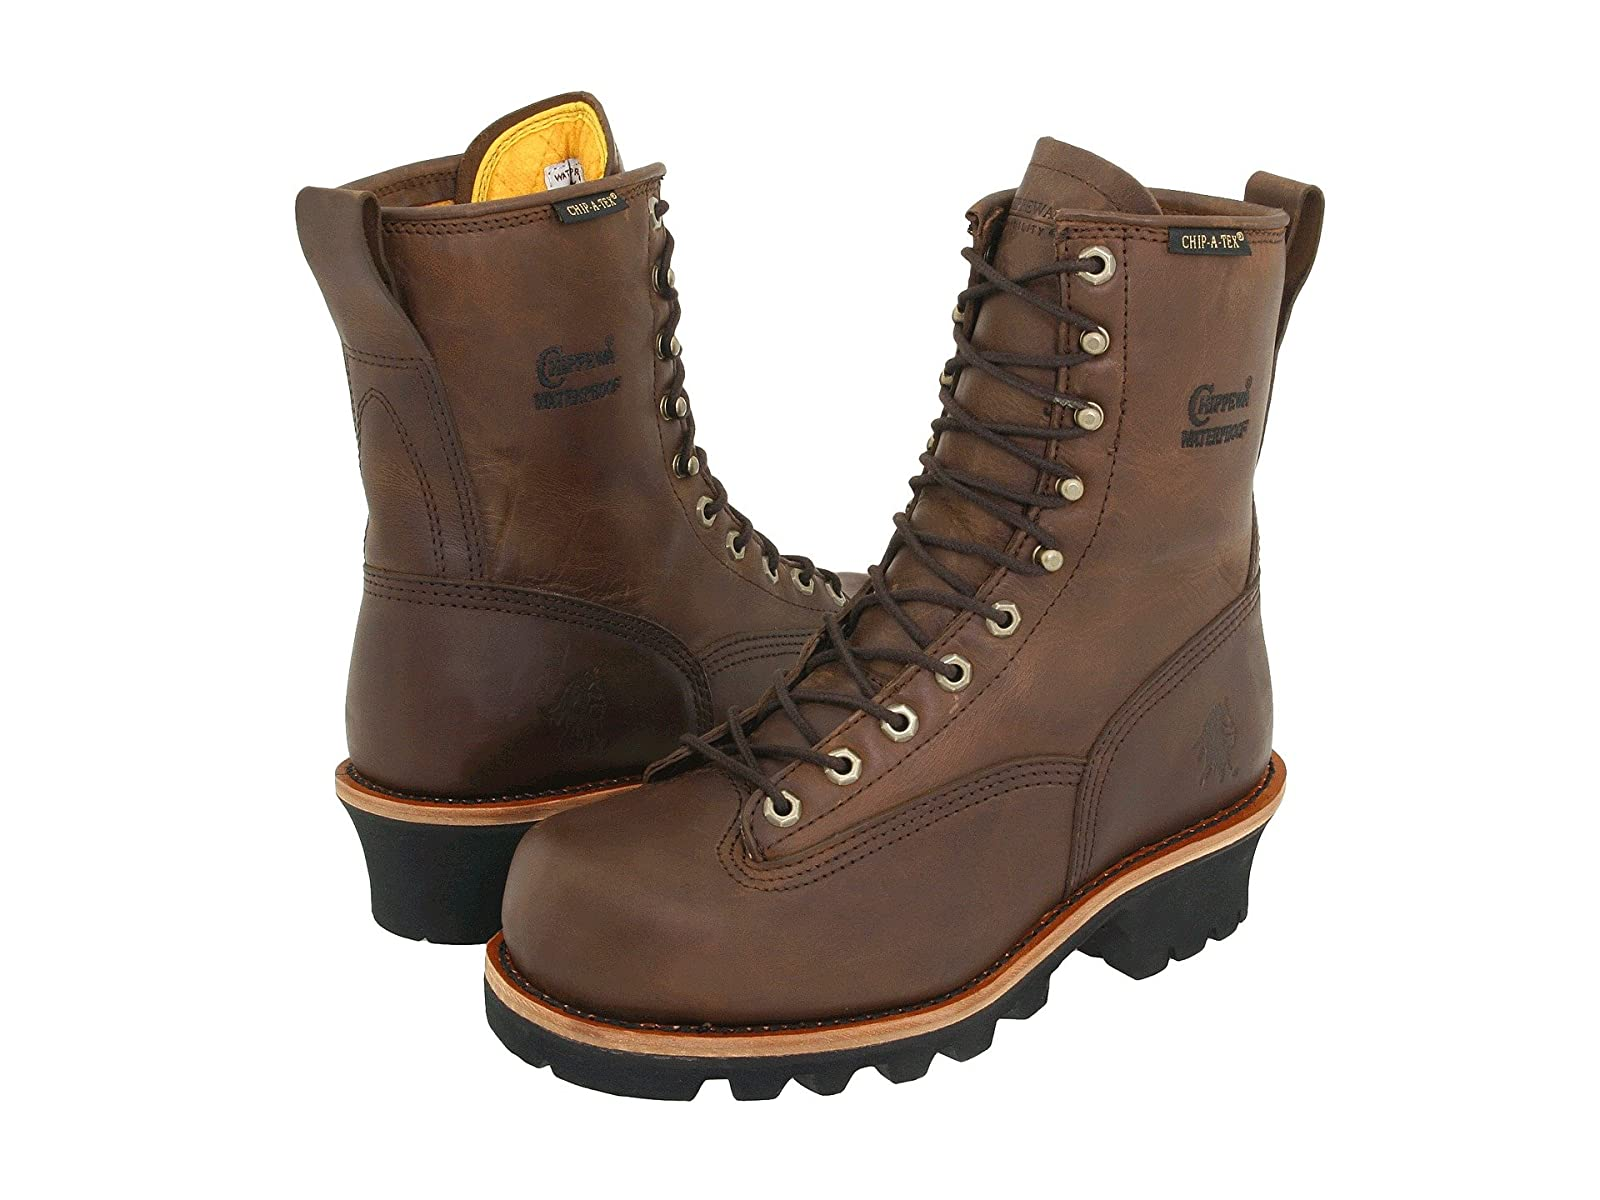 "Chippewa 8"" Bay Apache Toe Insulated Waterproof Steel Toe Apache Logger 6ba71b"